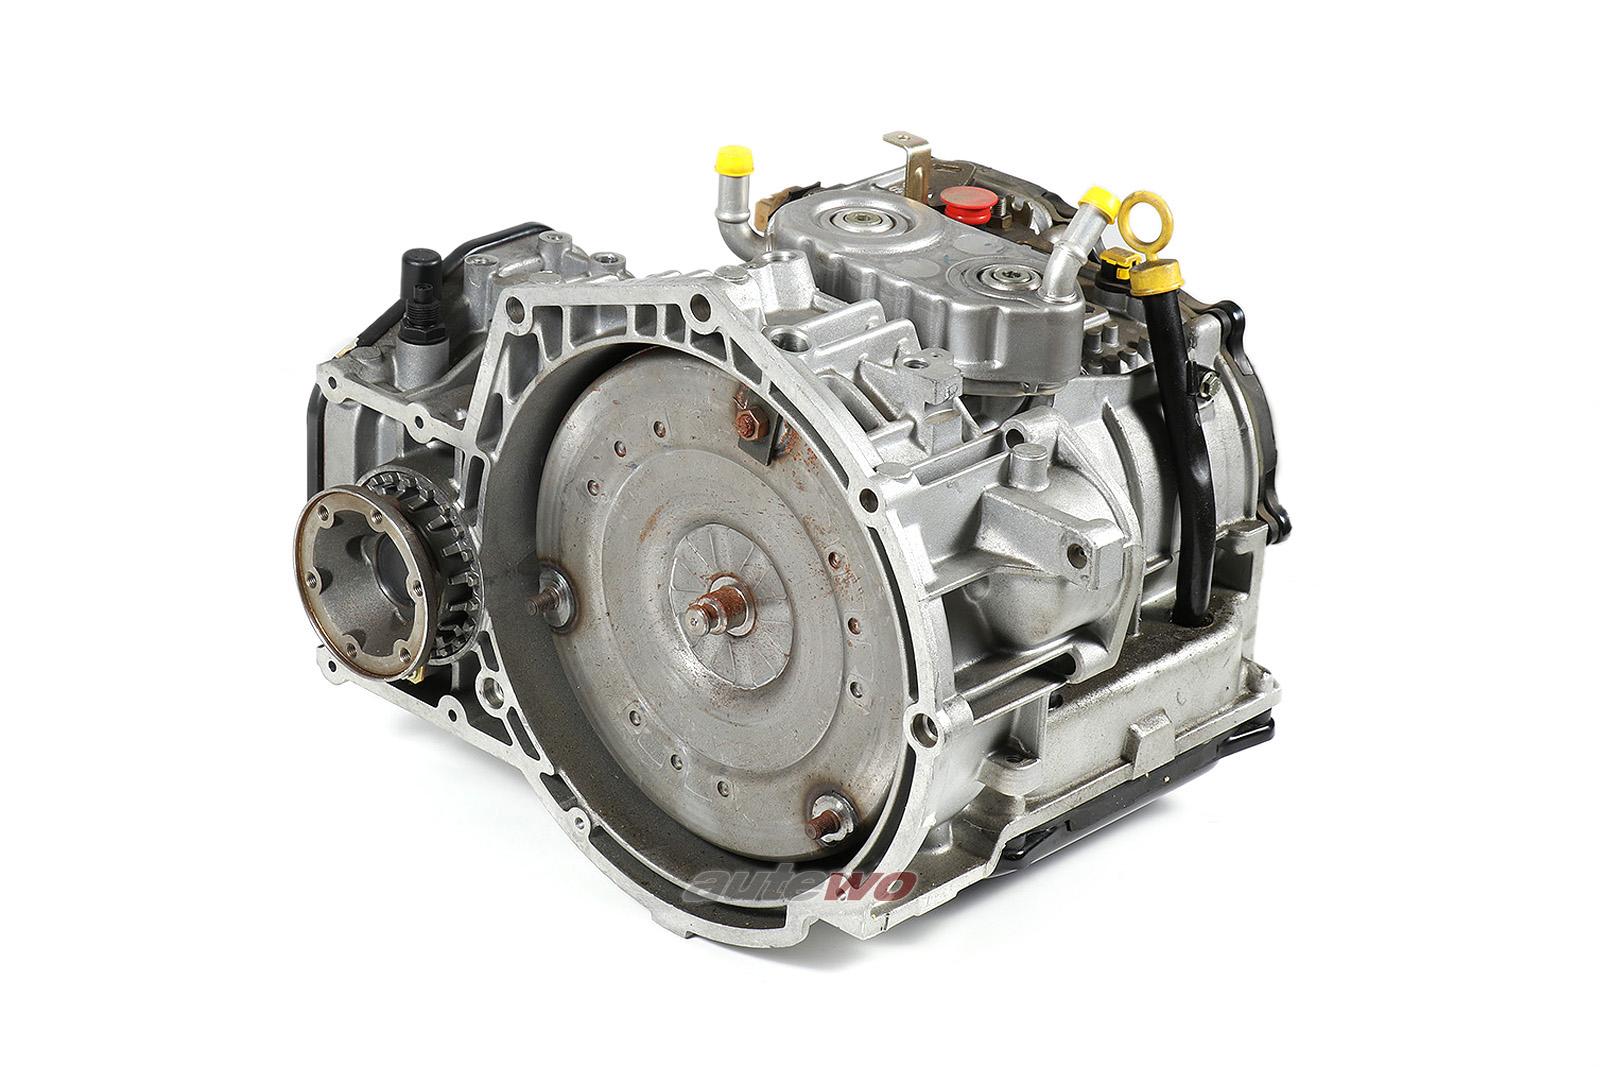 096300035KX NEU VW Corrado/Golf 3/Passat B3 2.0l 16VAutomatikgetriebe CBZ 04120X